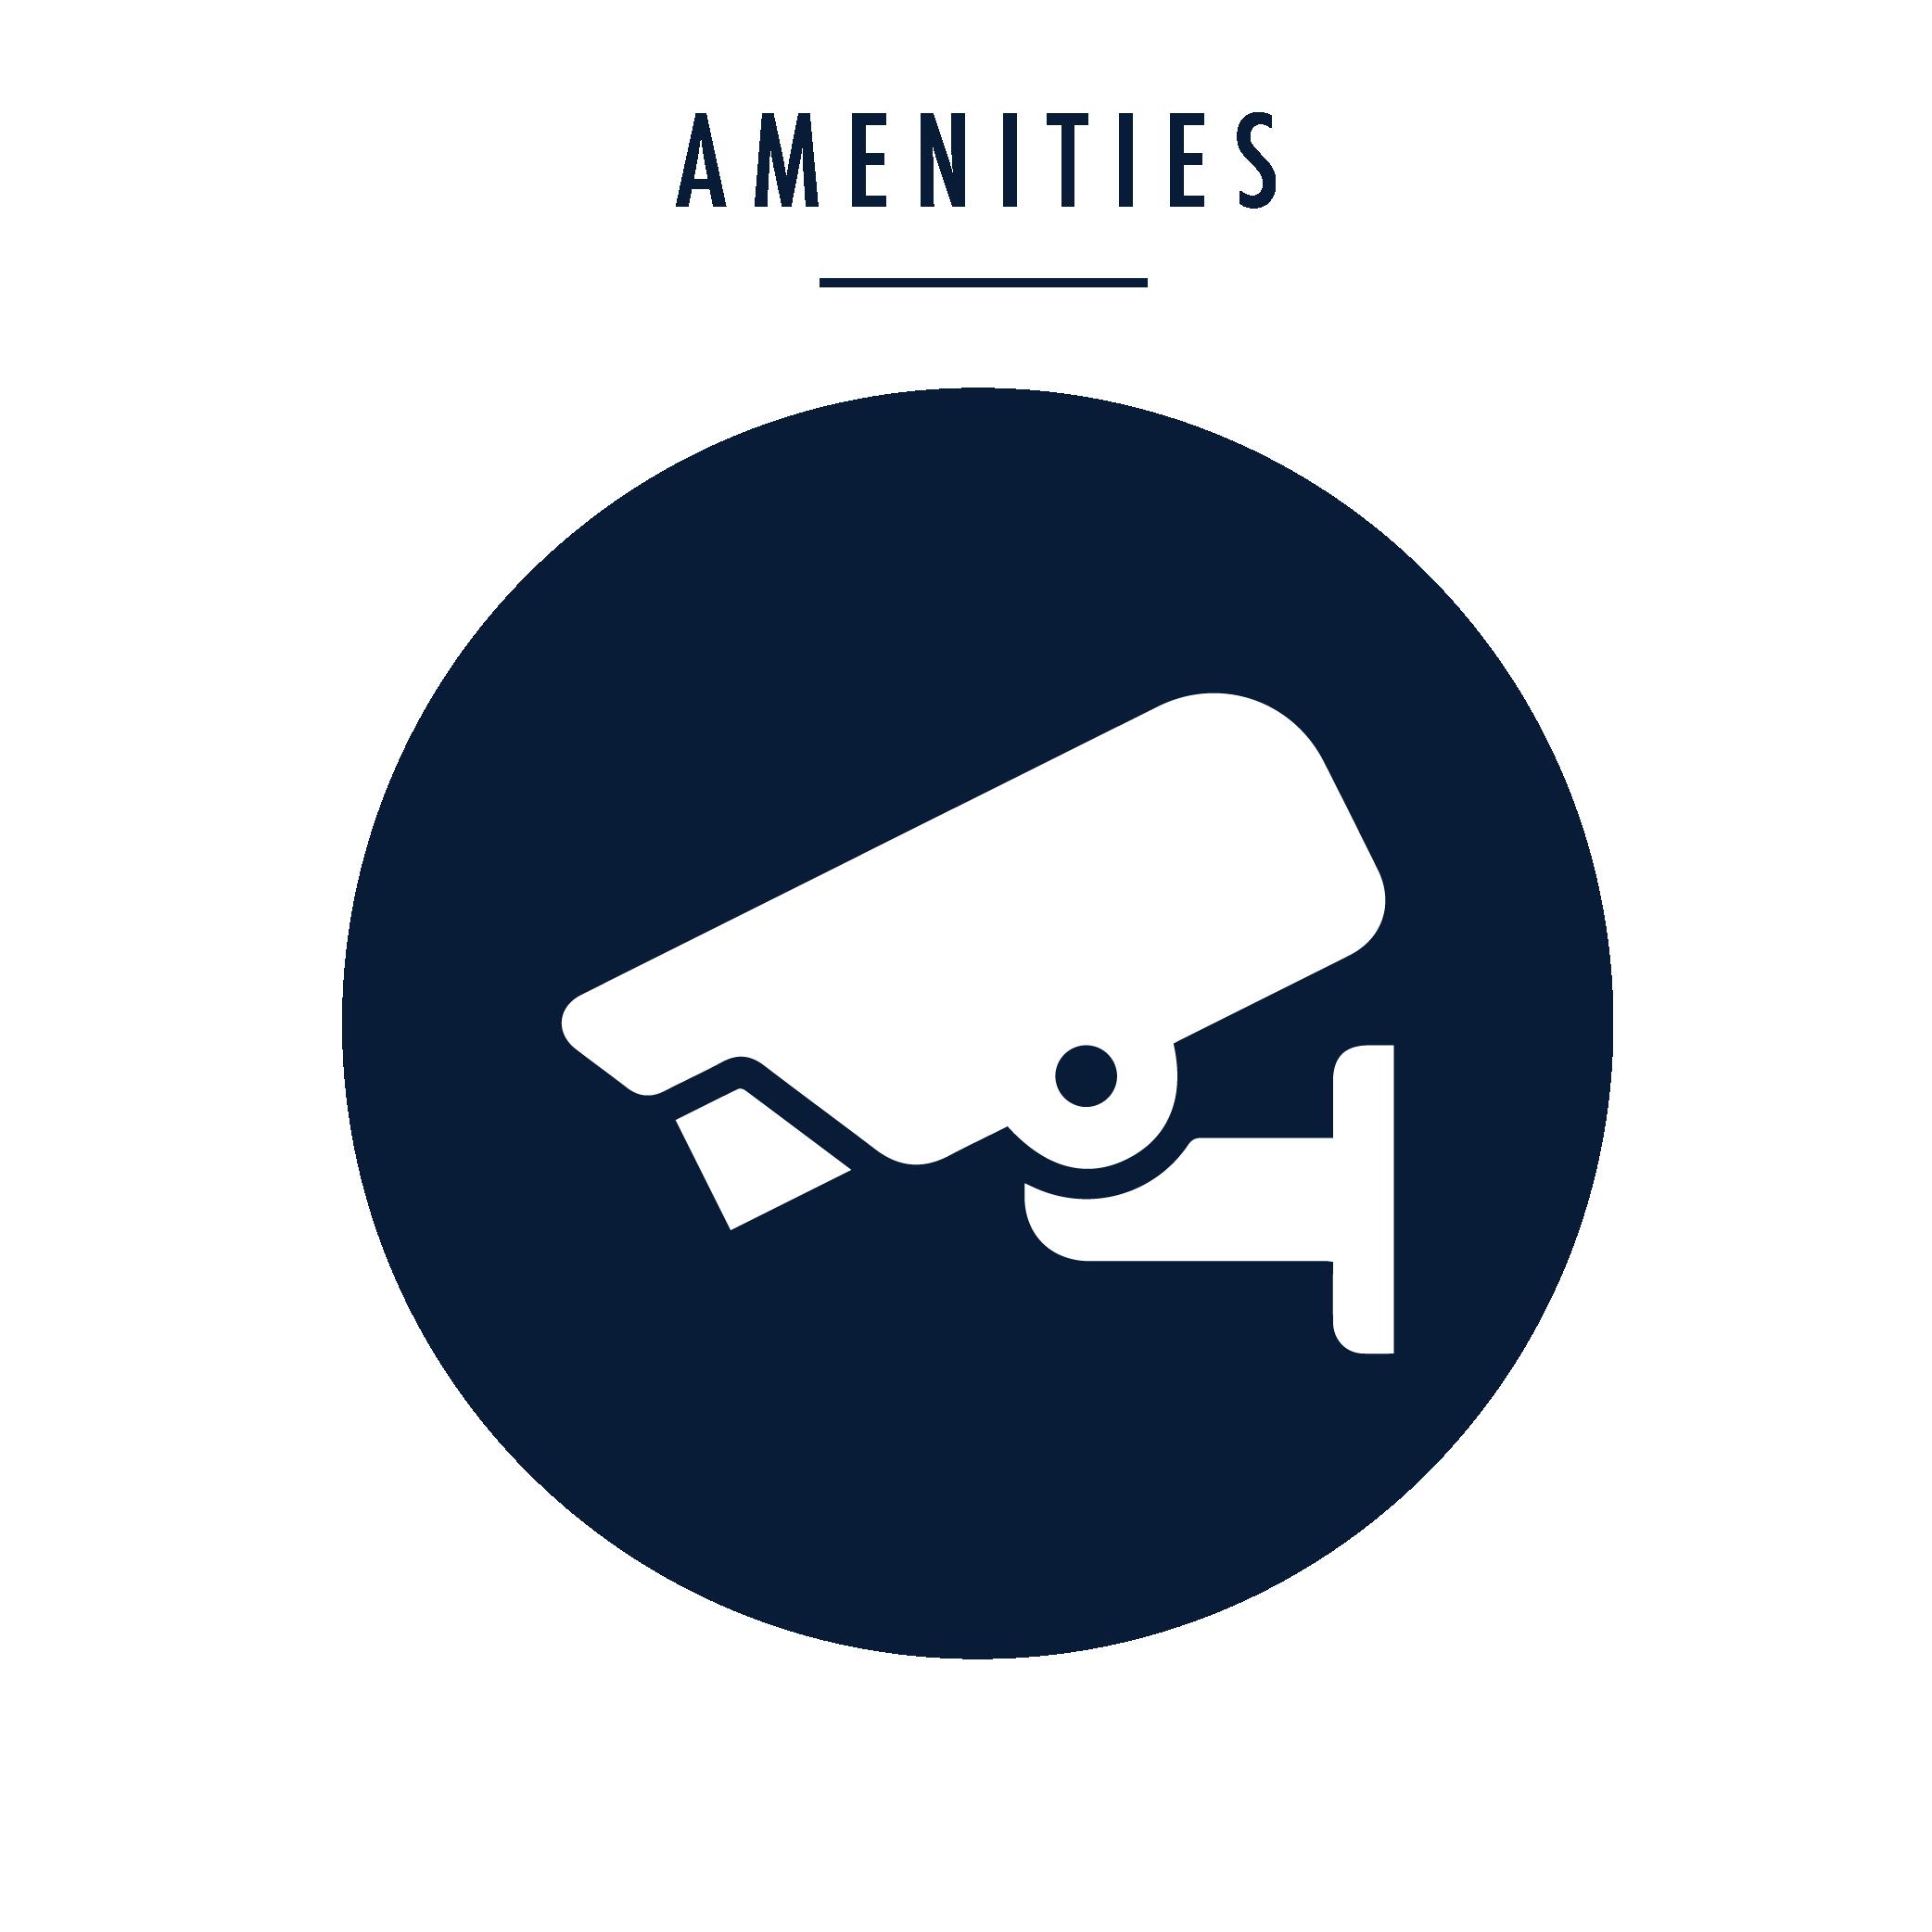 amenities-01.png